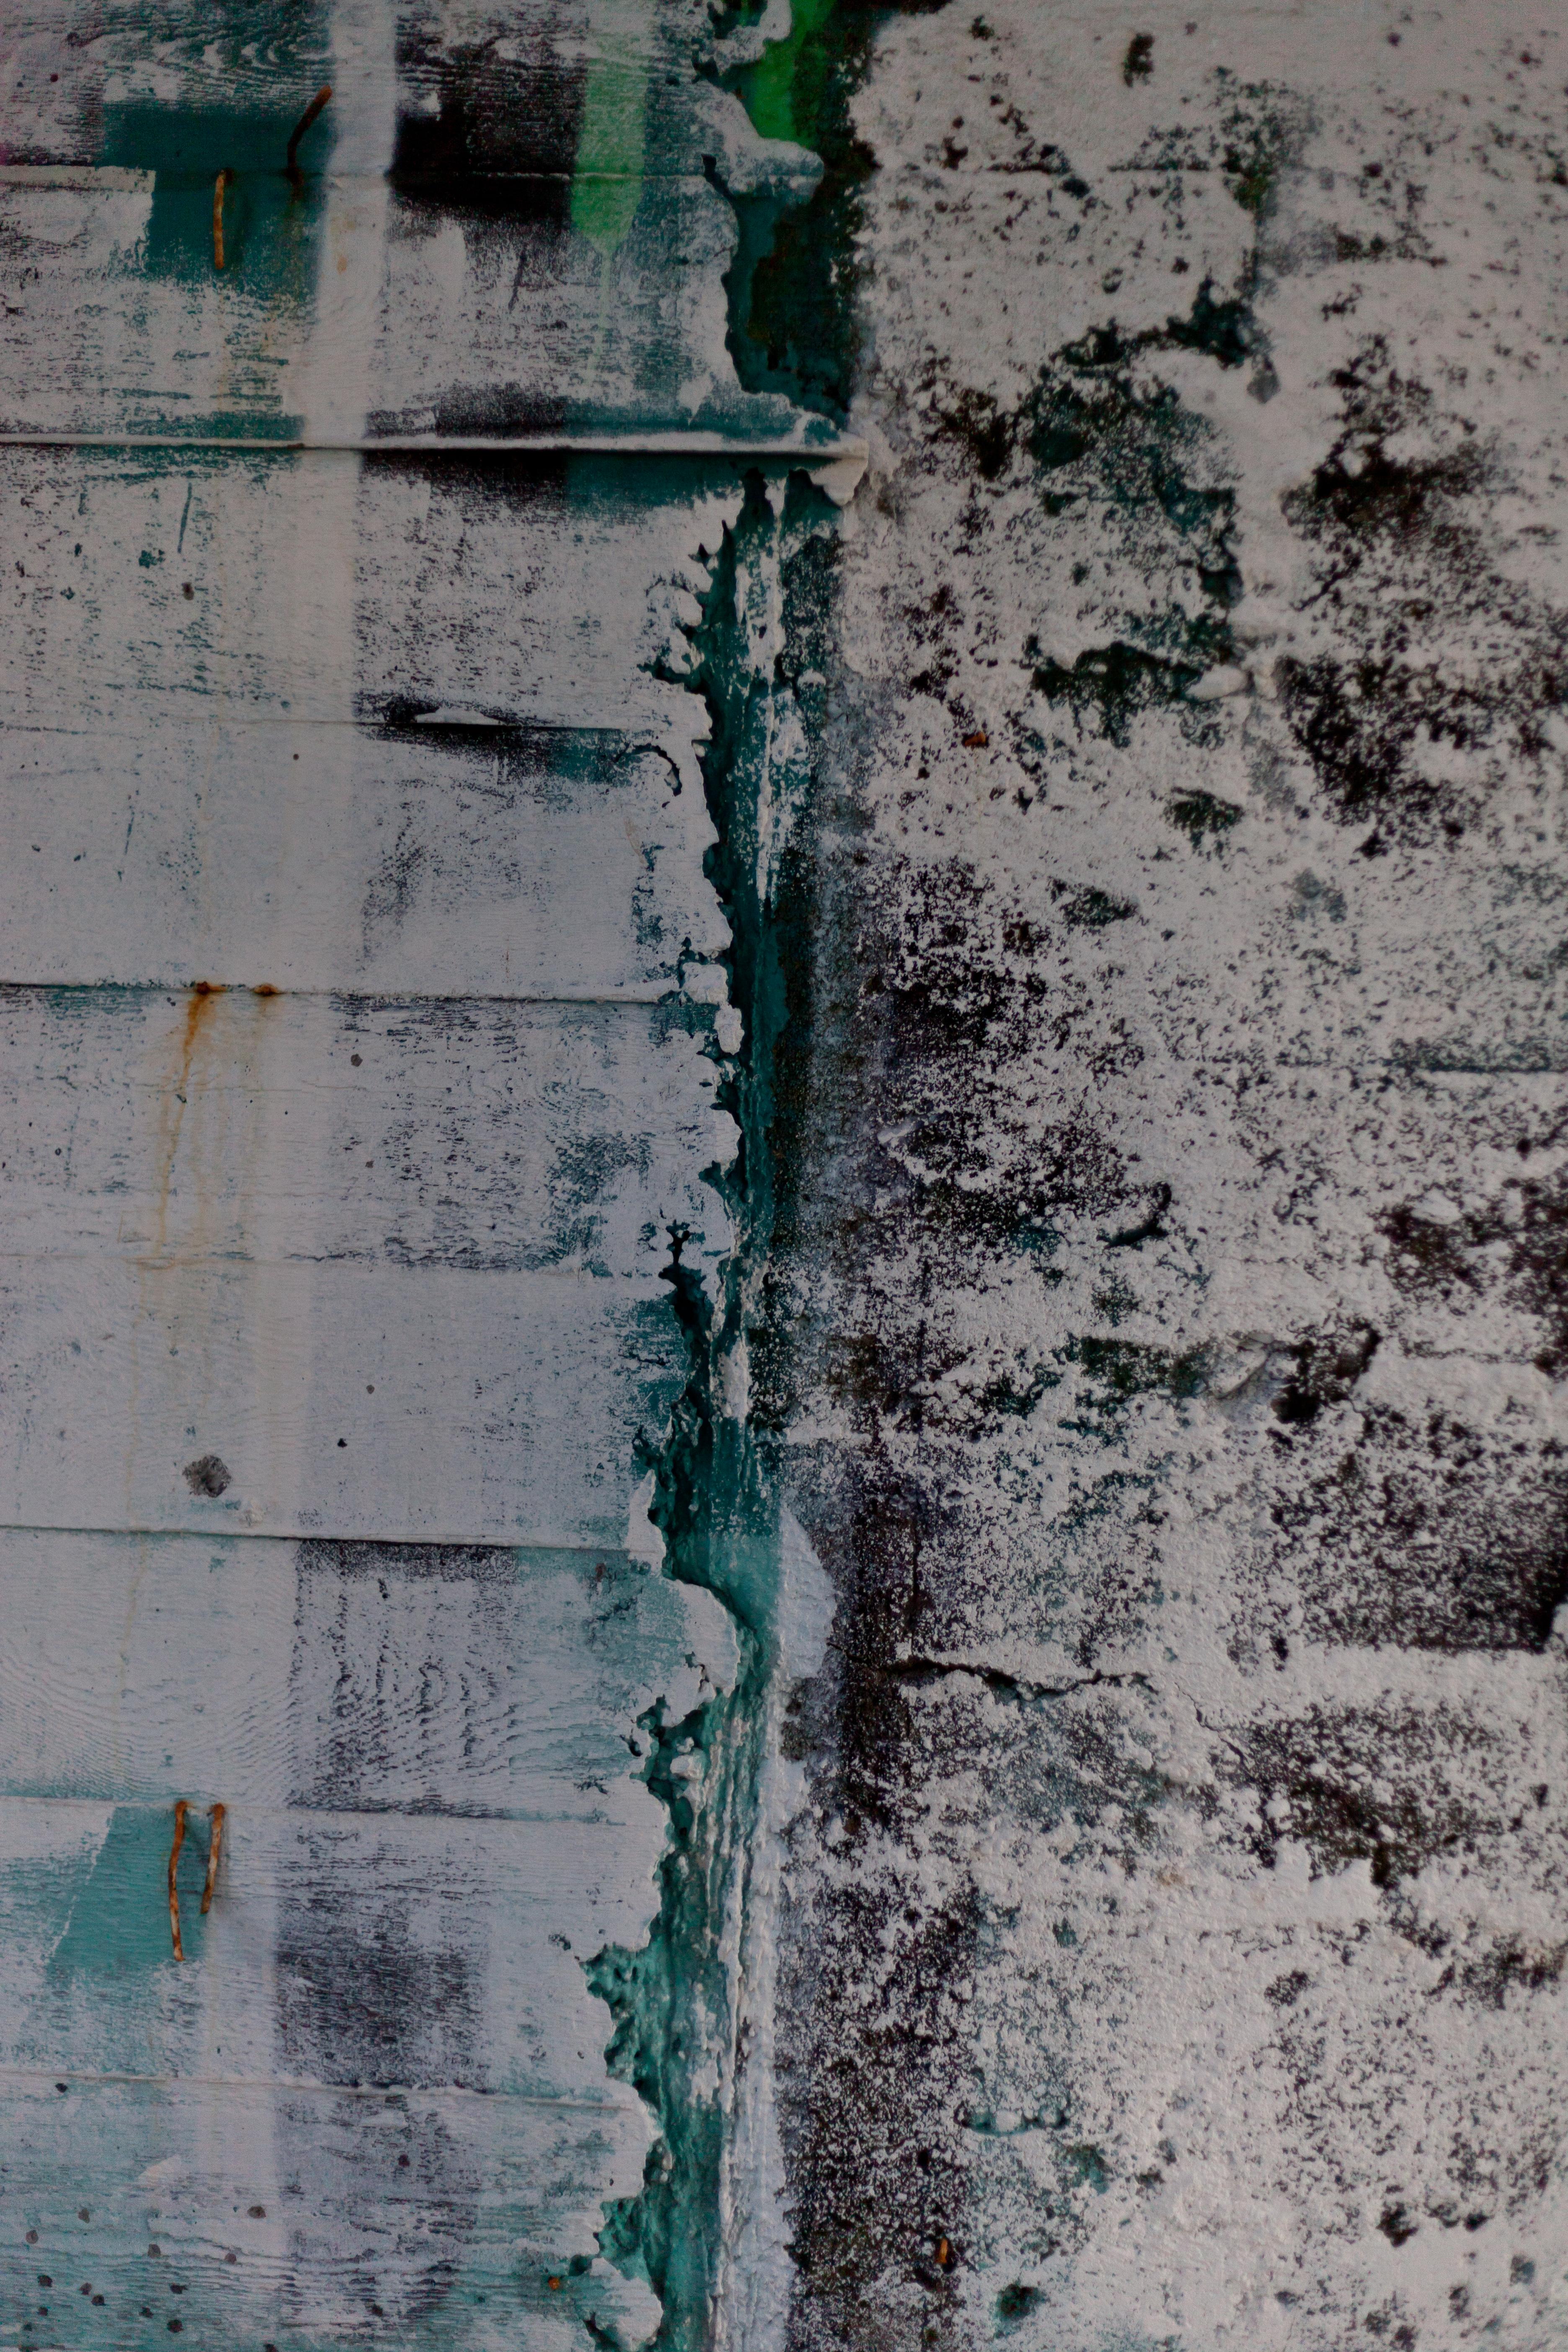 Grunge White Wall Texture, Concrete, Damaged, Details, Grunge, HQ Photo